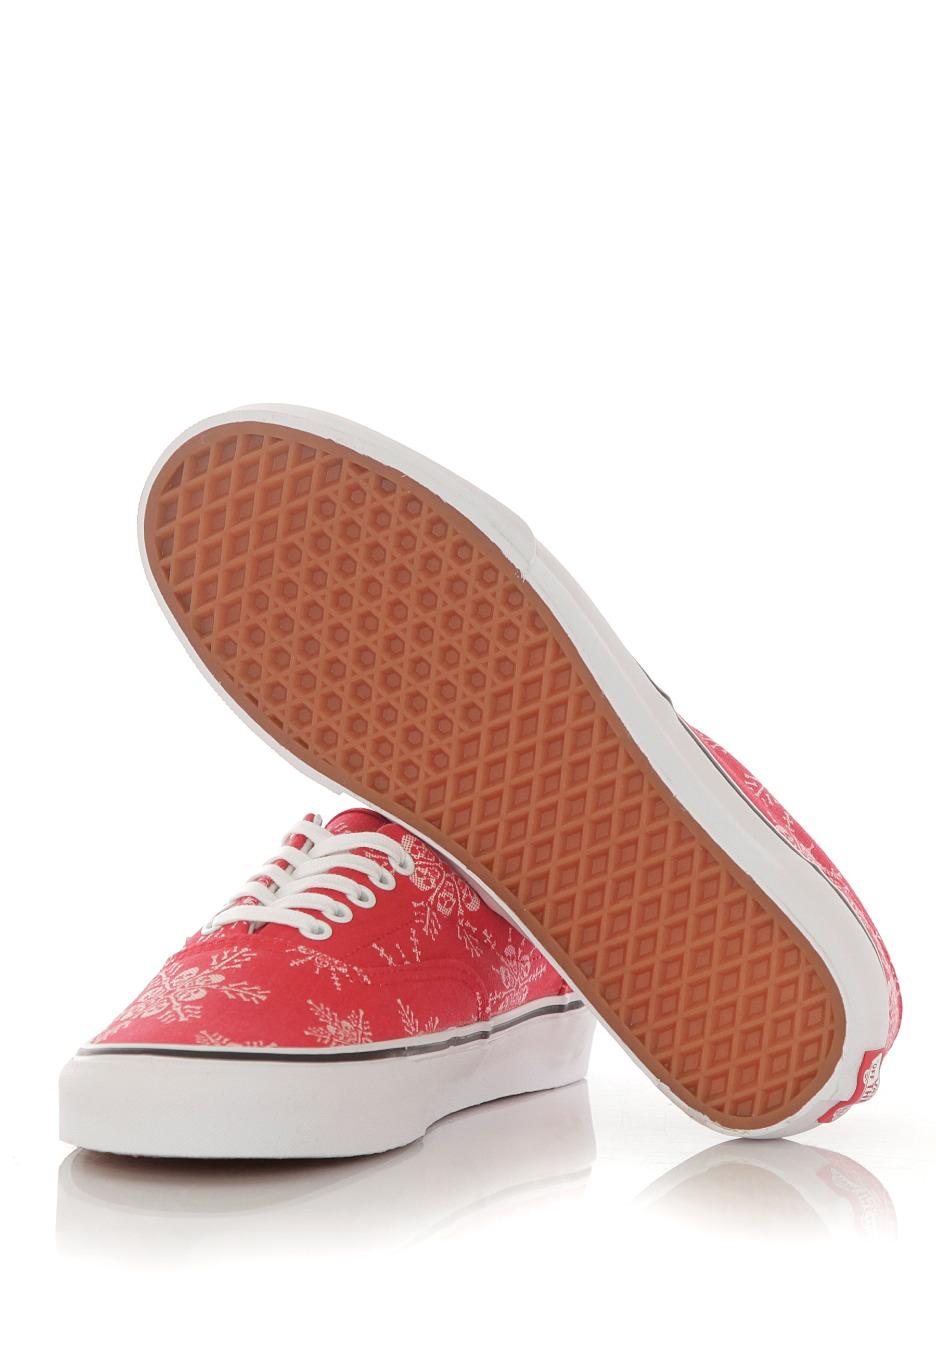 d714a9450753 Vans - Era Van Doren Skull Snowflake Racing Red - Shoes - Impericon ...